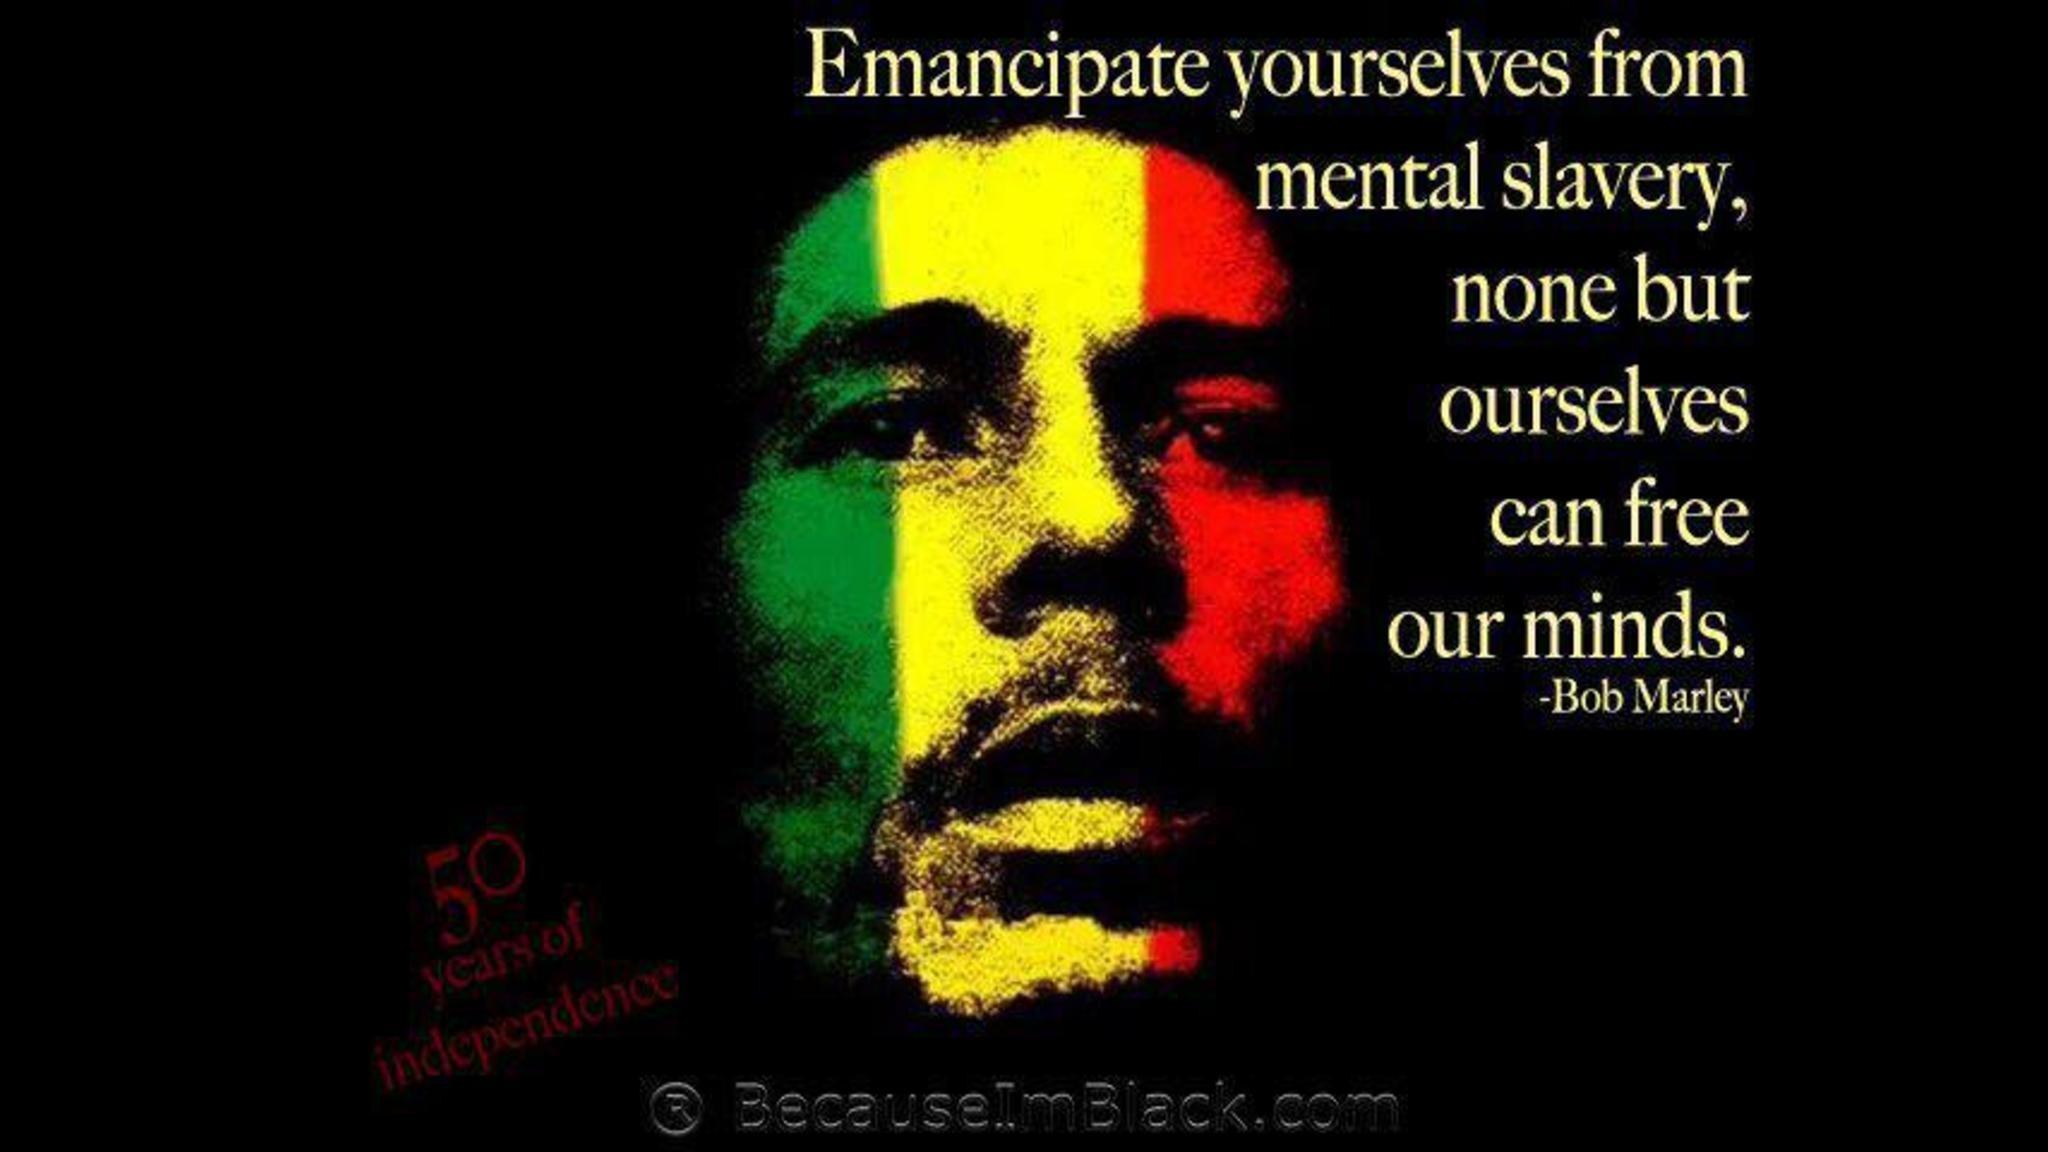 Bob Marley Quotes Wallpaper HD Free | SmaData.com